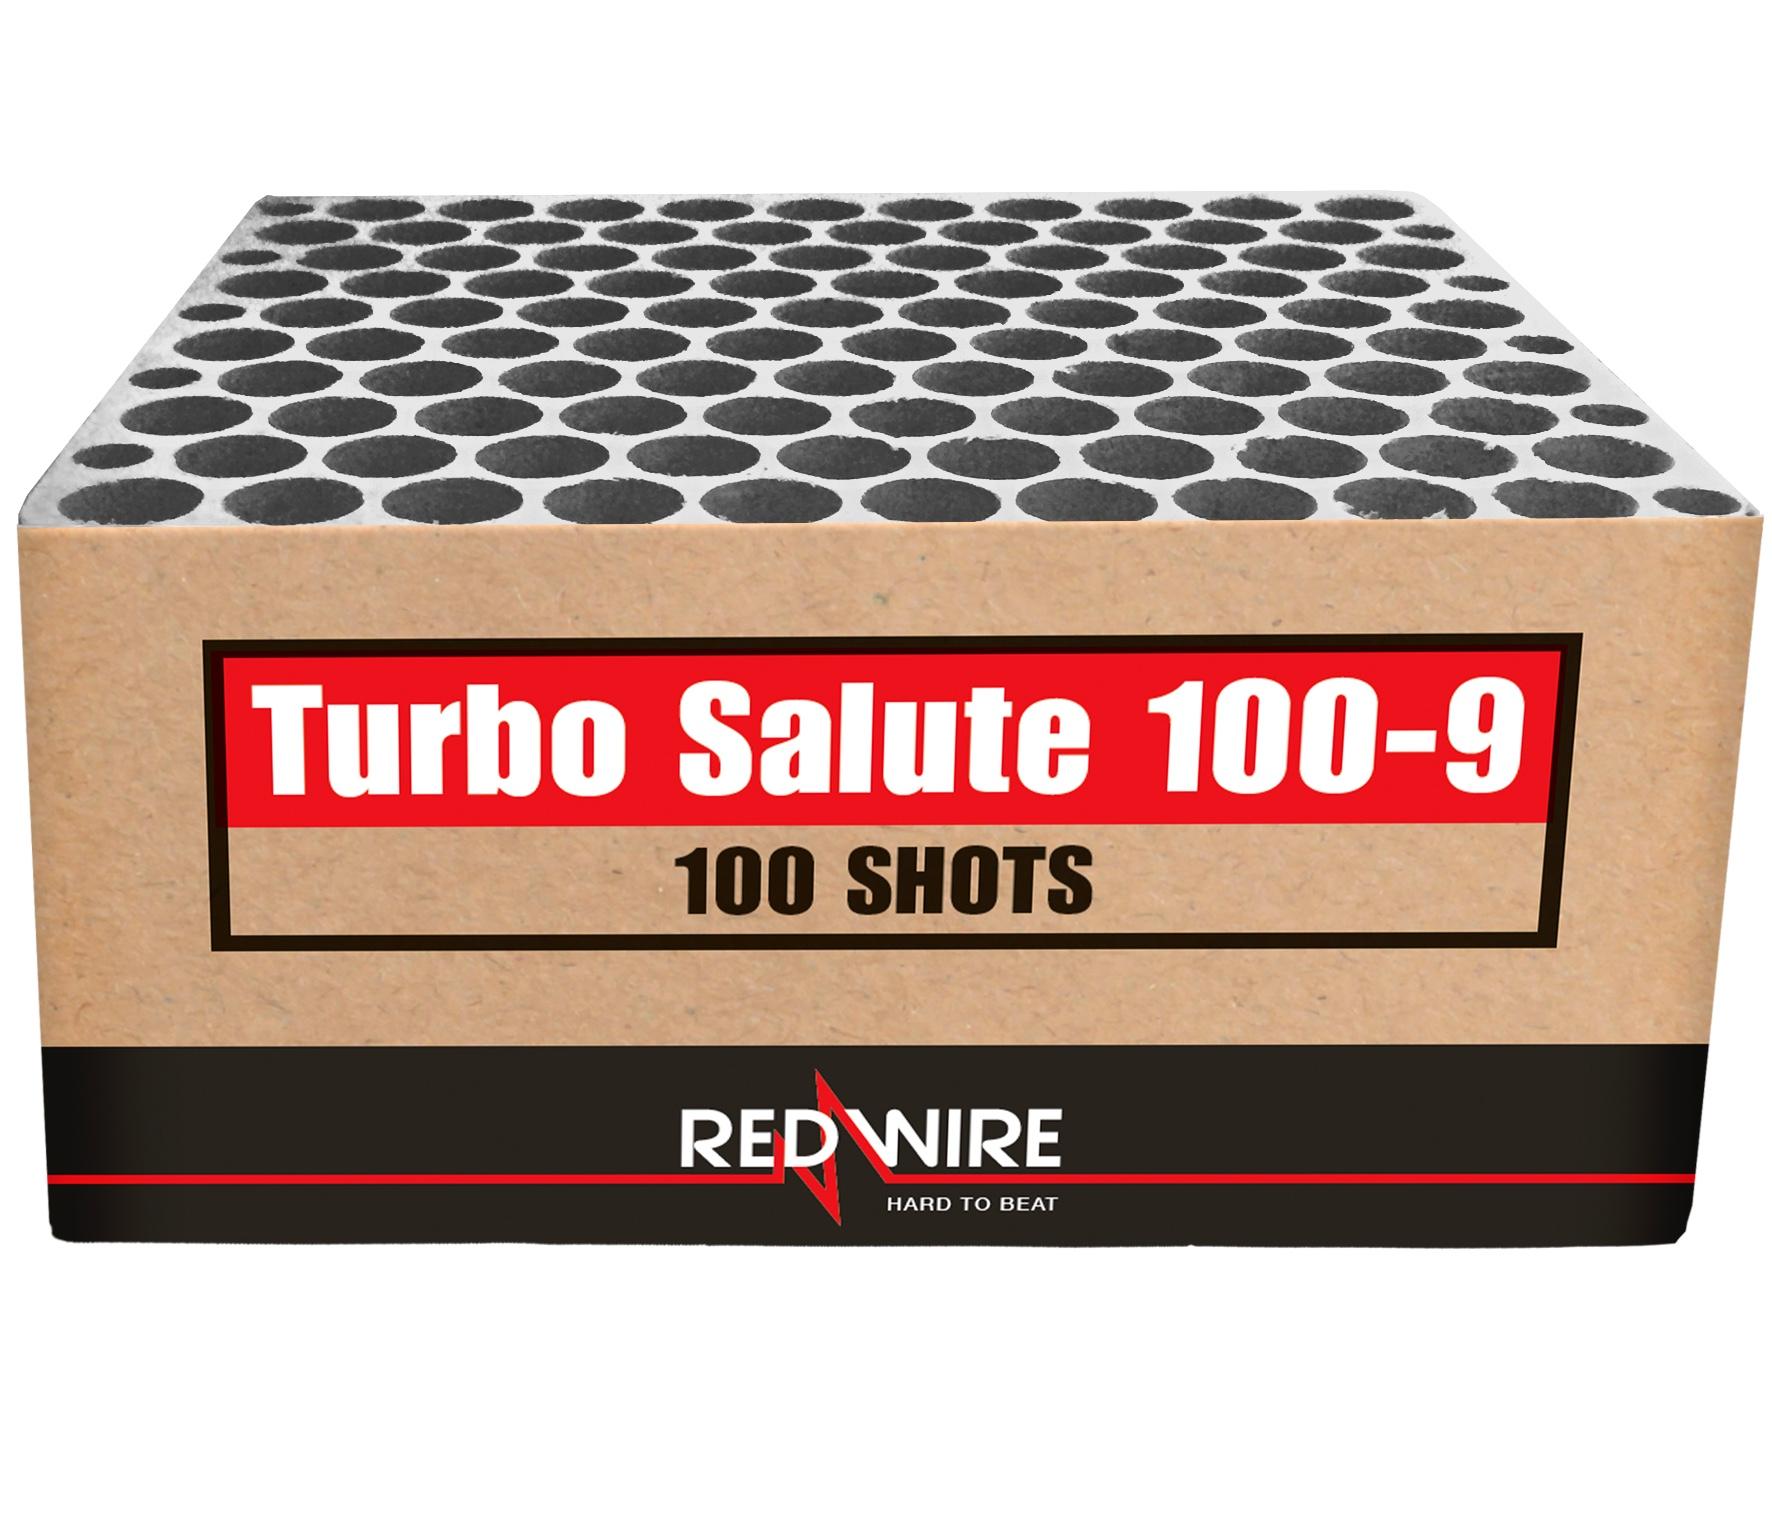 Turbo Salute 100 schots